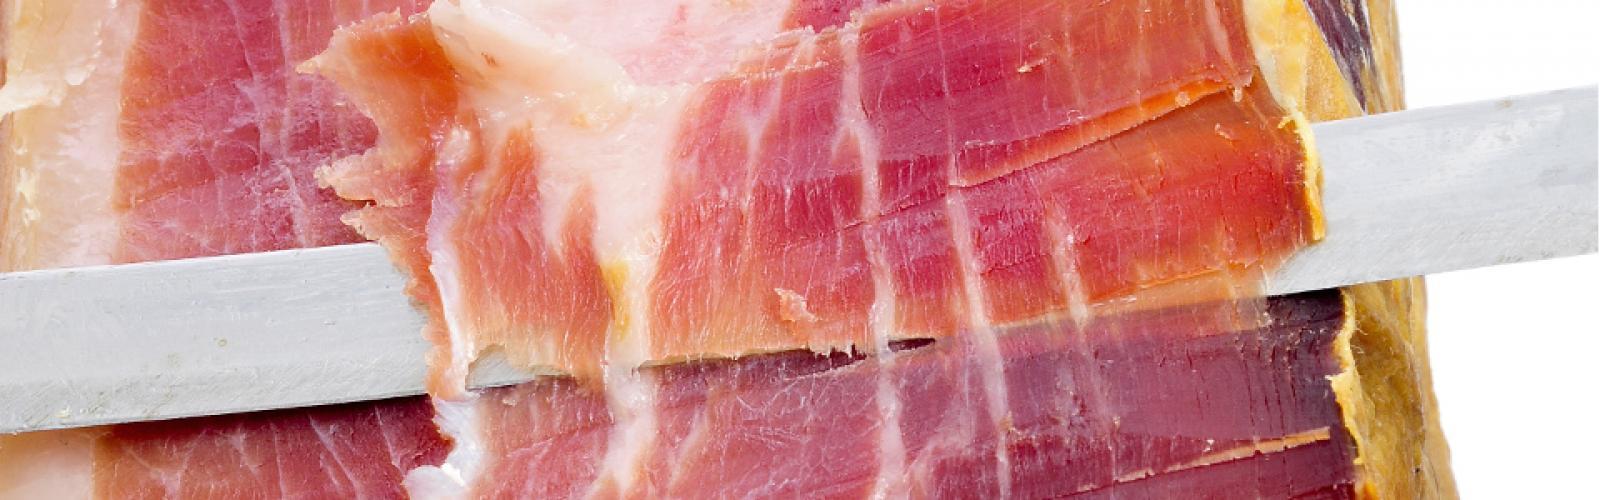 Ham Slicing Knife